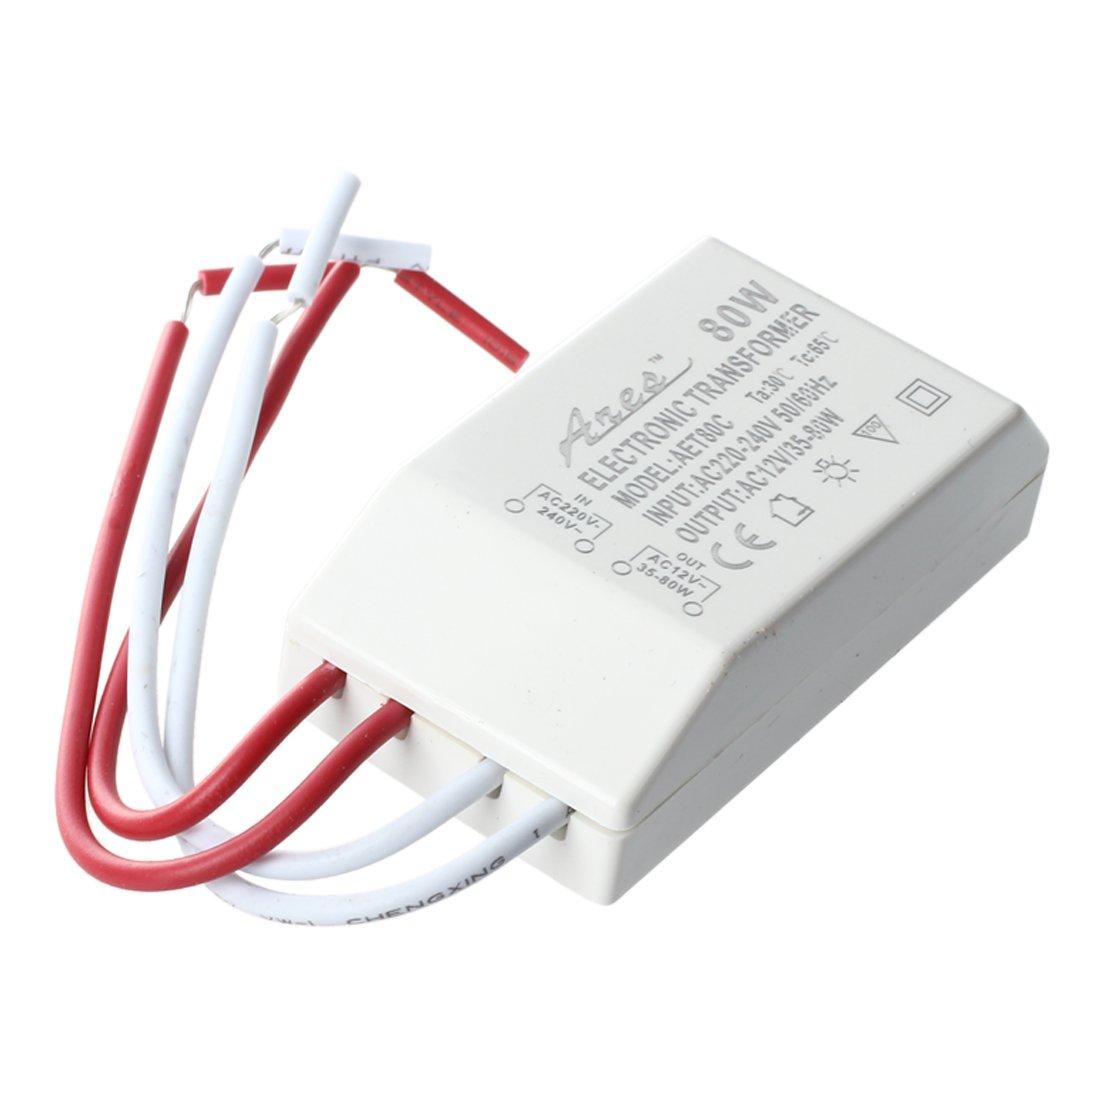 TOOGOO(R) SMD Halogen Light Transformer Power Supply Driver 80W 12V for MR16 MR11